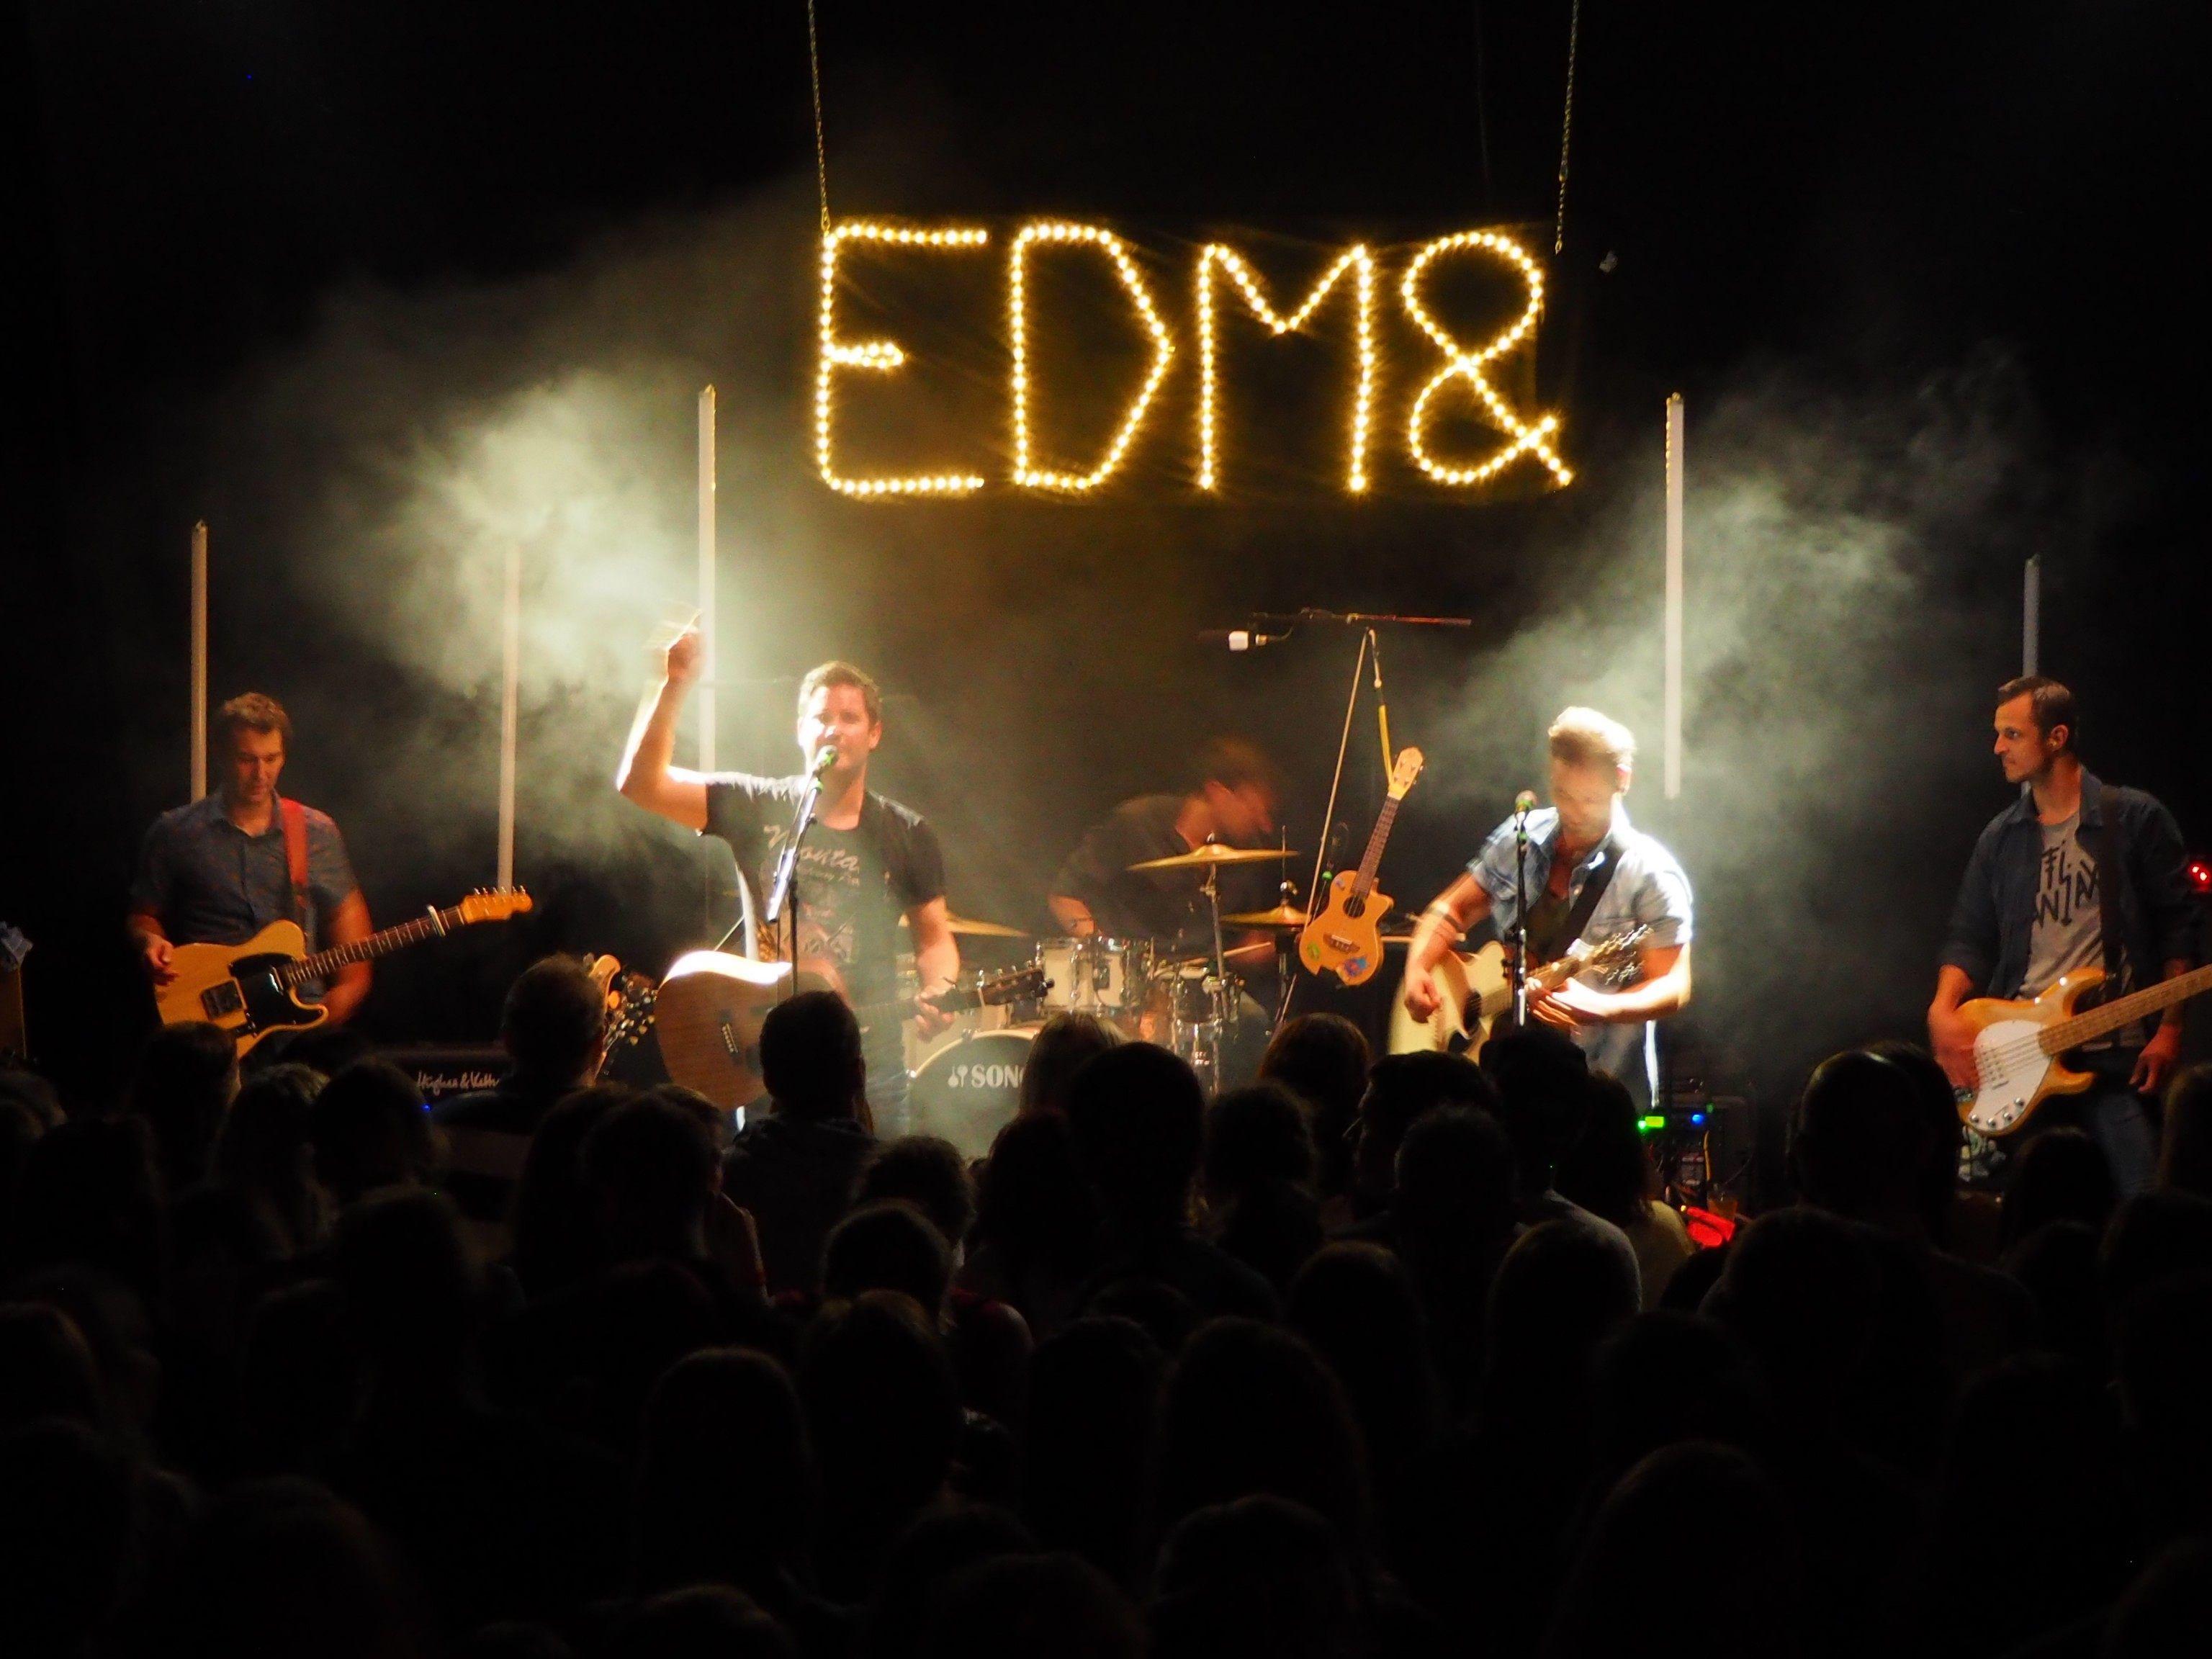 Edmund Band